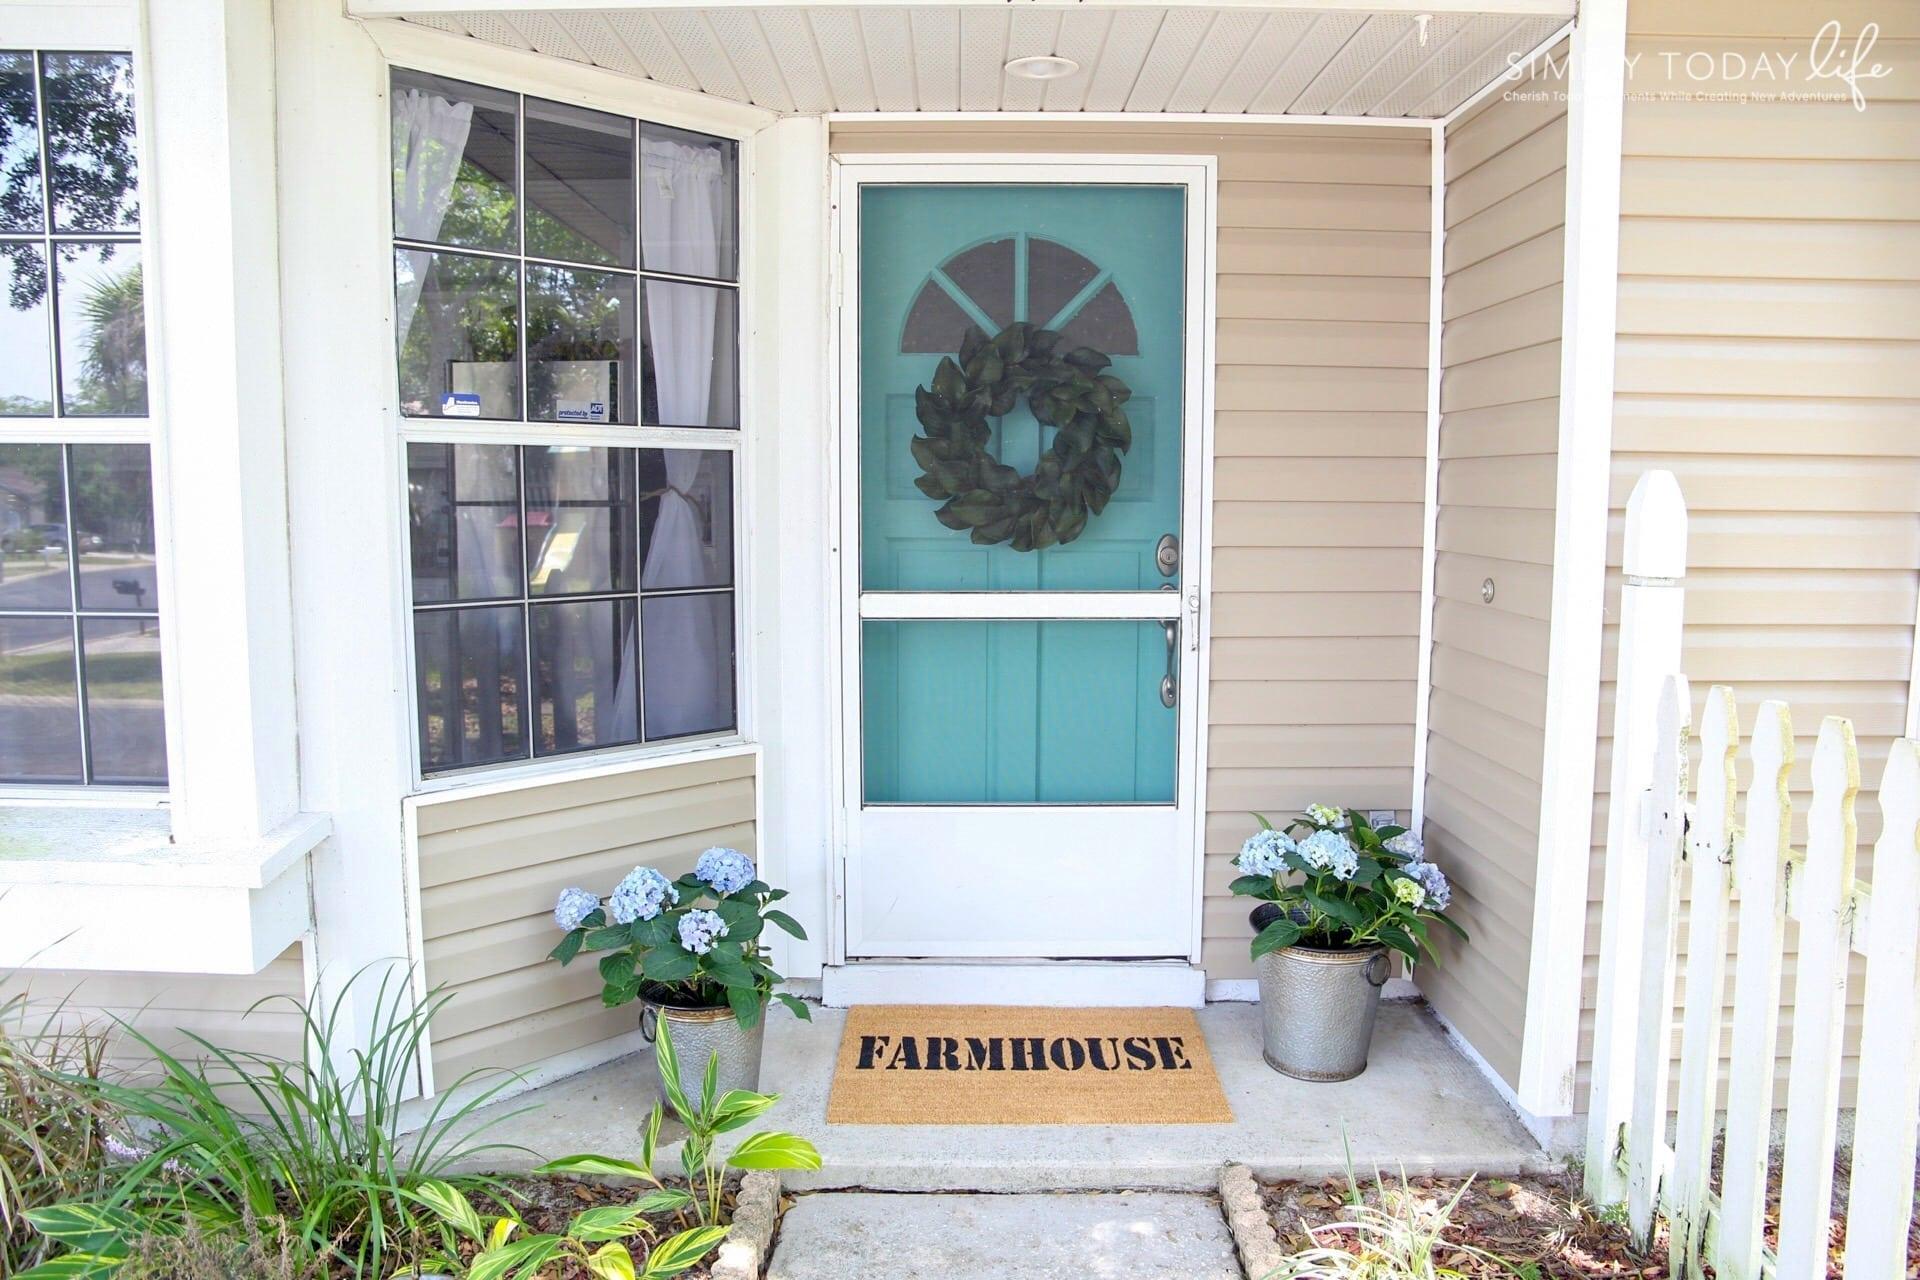 Diy Front Door Custom Mat Farmhouse  Simplytodaylifecom